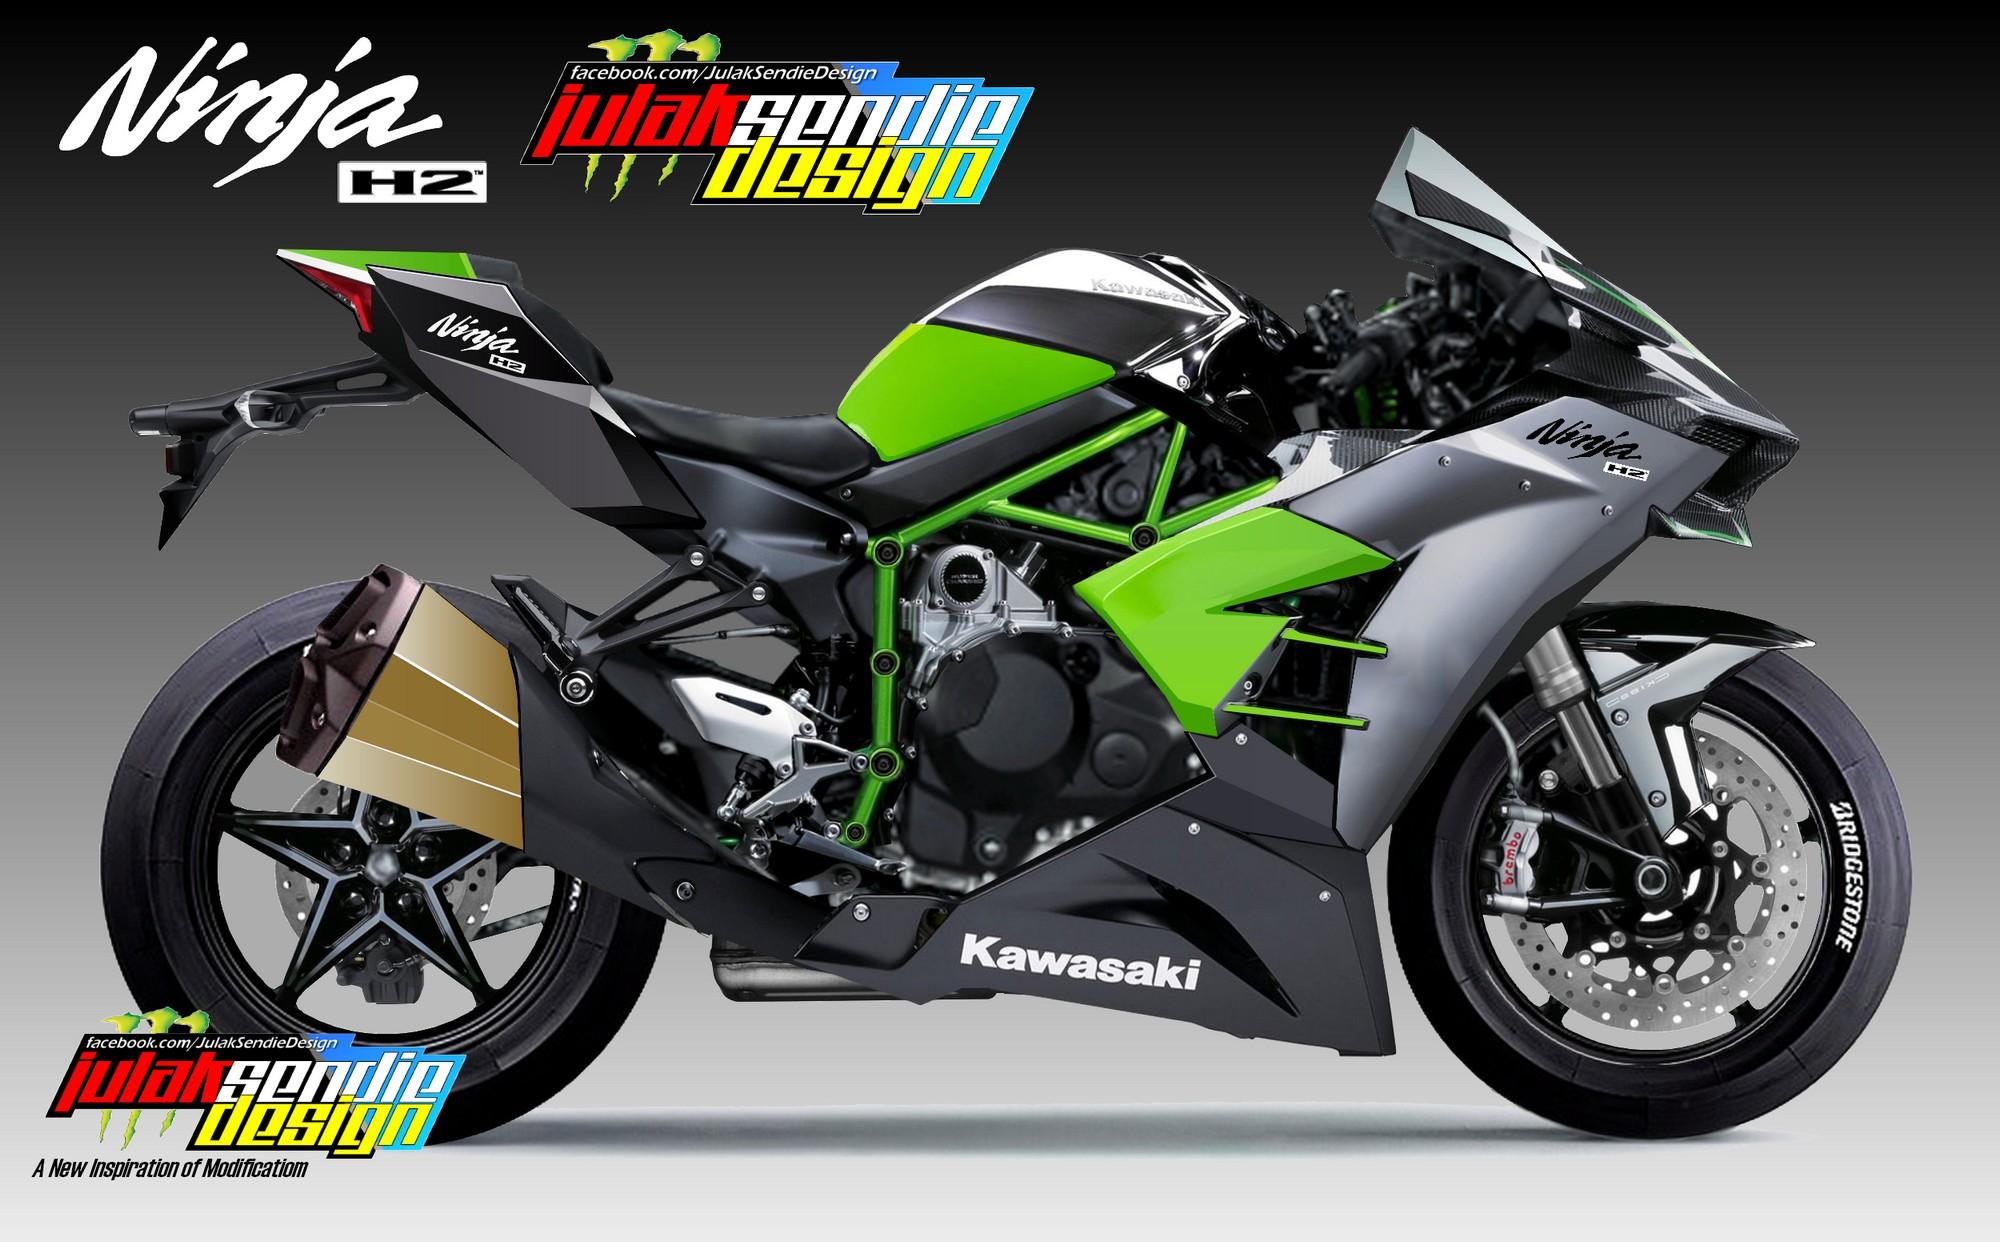 99 Gambar Motor Ninja H 2 Terkeren Obeng Motor